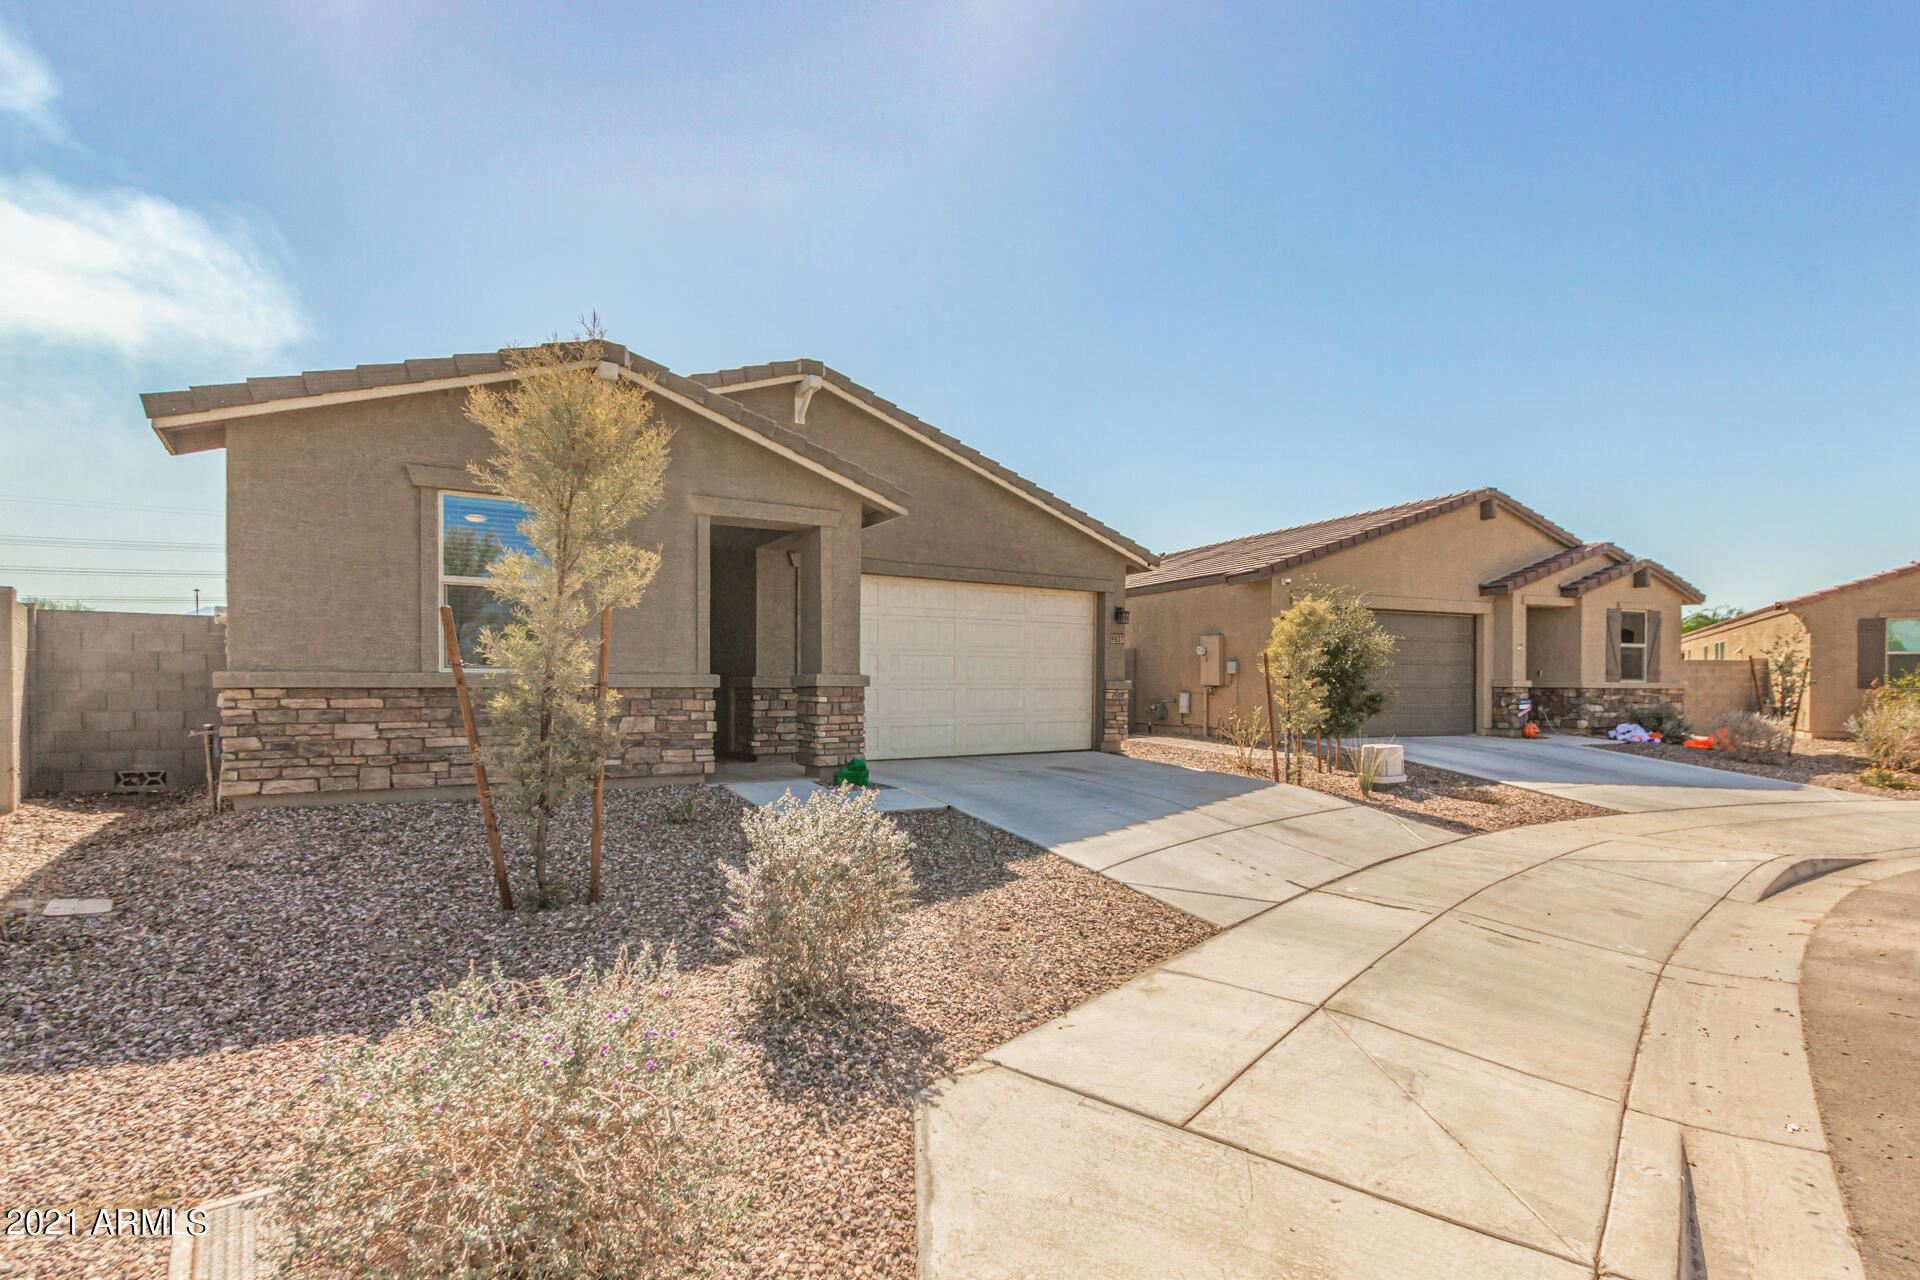 Photo of 9837 W SOUTHGATE Avenue, Tolleson, AZ 85353 (MLS # 6303827)